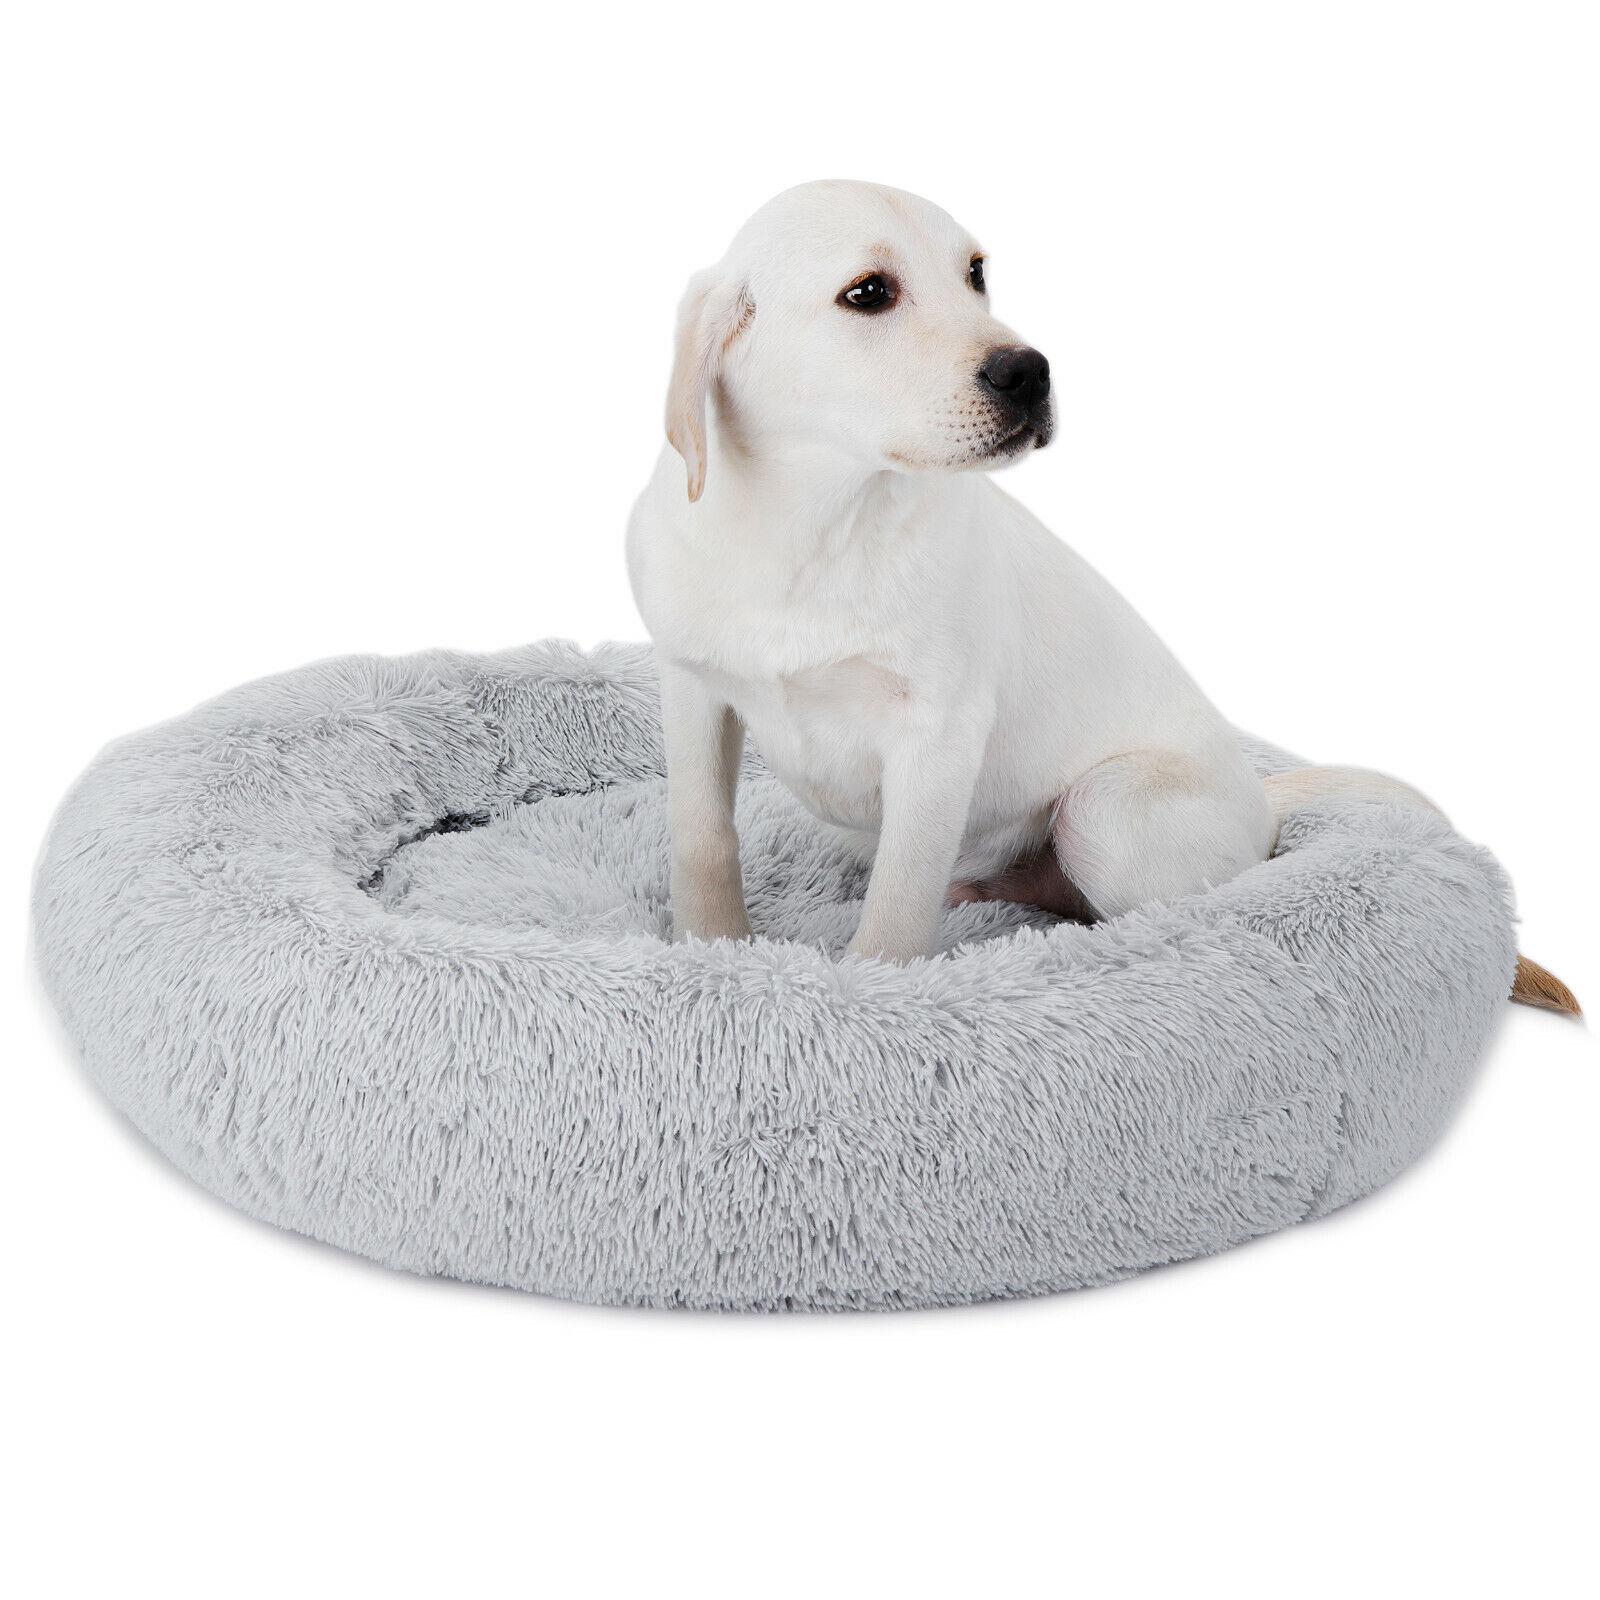 30″x30″ Grey Shaggy Fluffy Pet Bed Dog Cat Donut Cuddler Cushion Mats Machine Beds